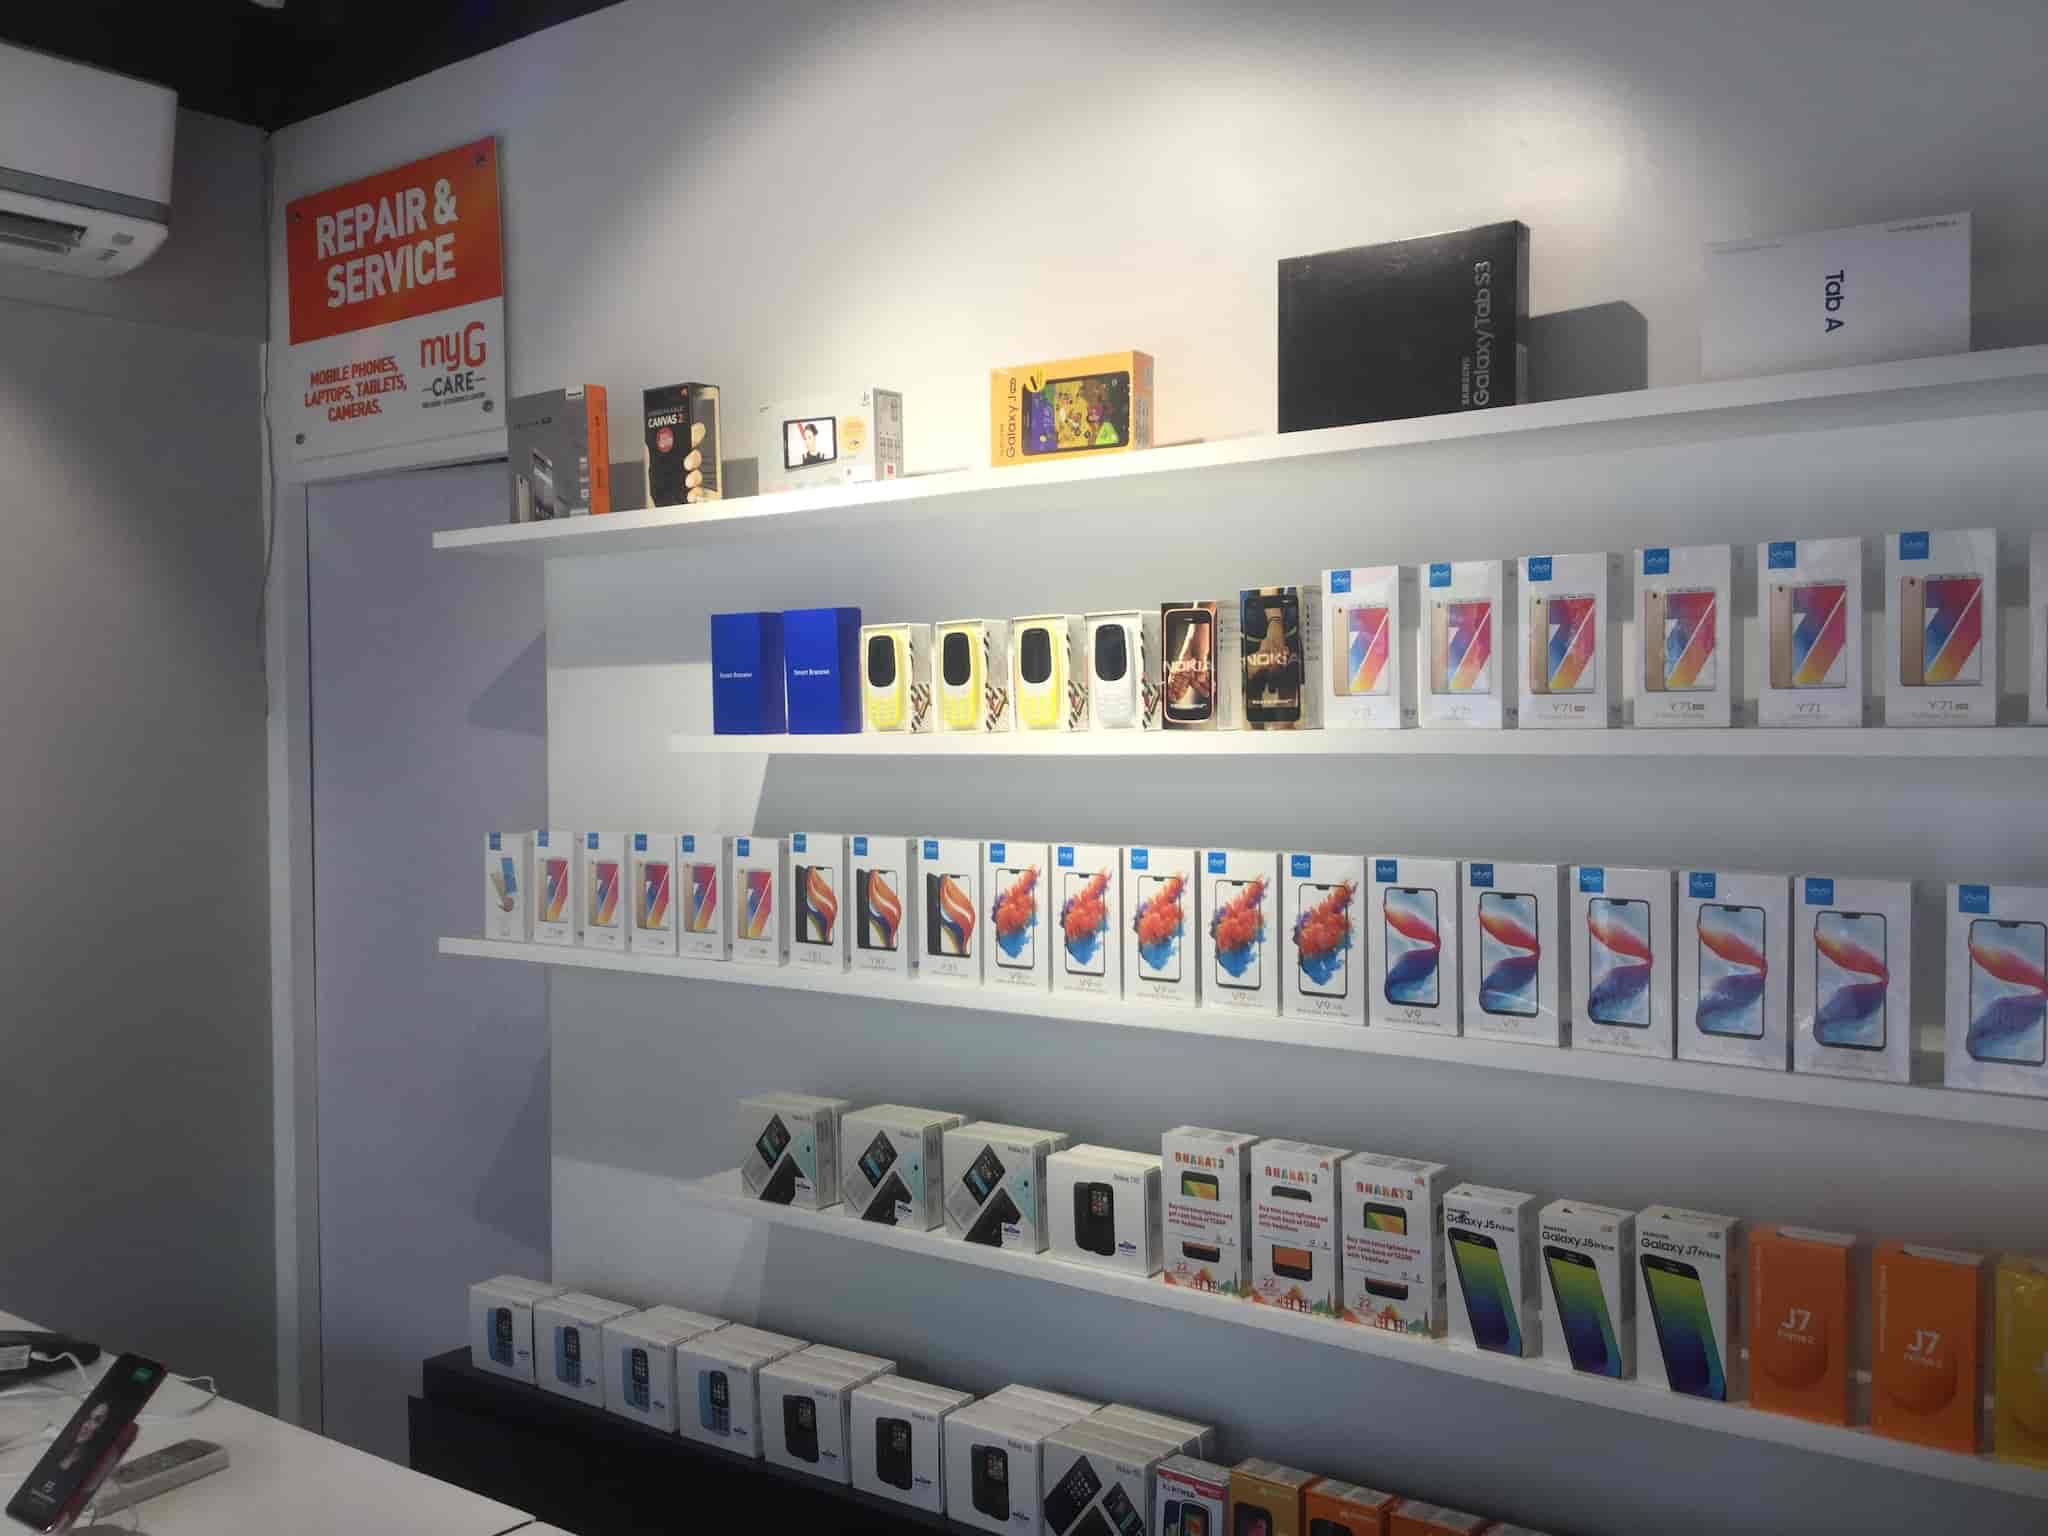 3g Digital World, Ymca Road - Mobile Phone Dealers in